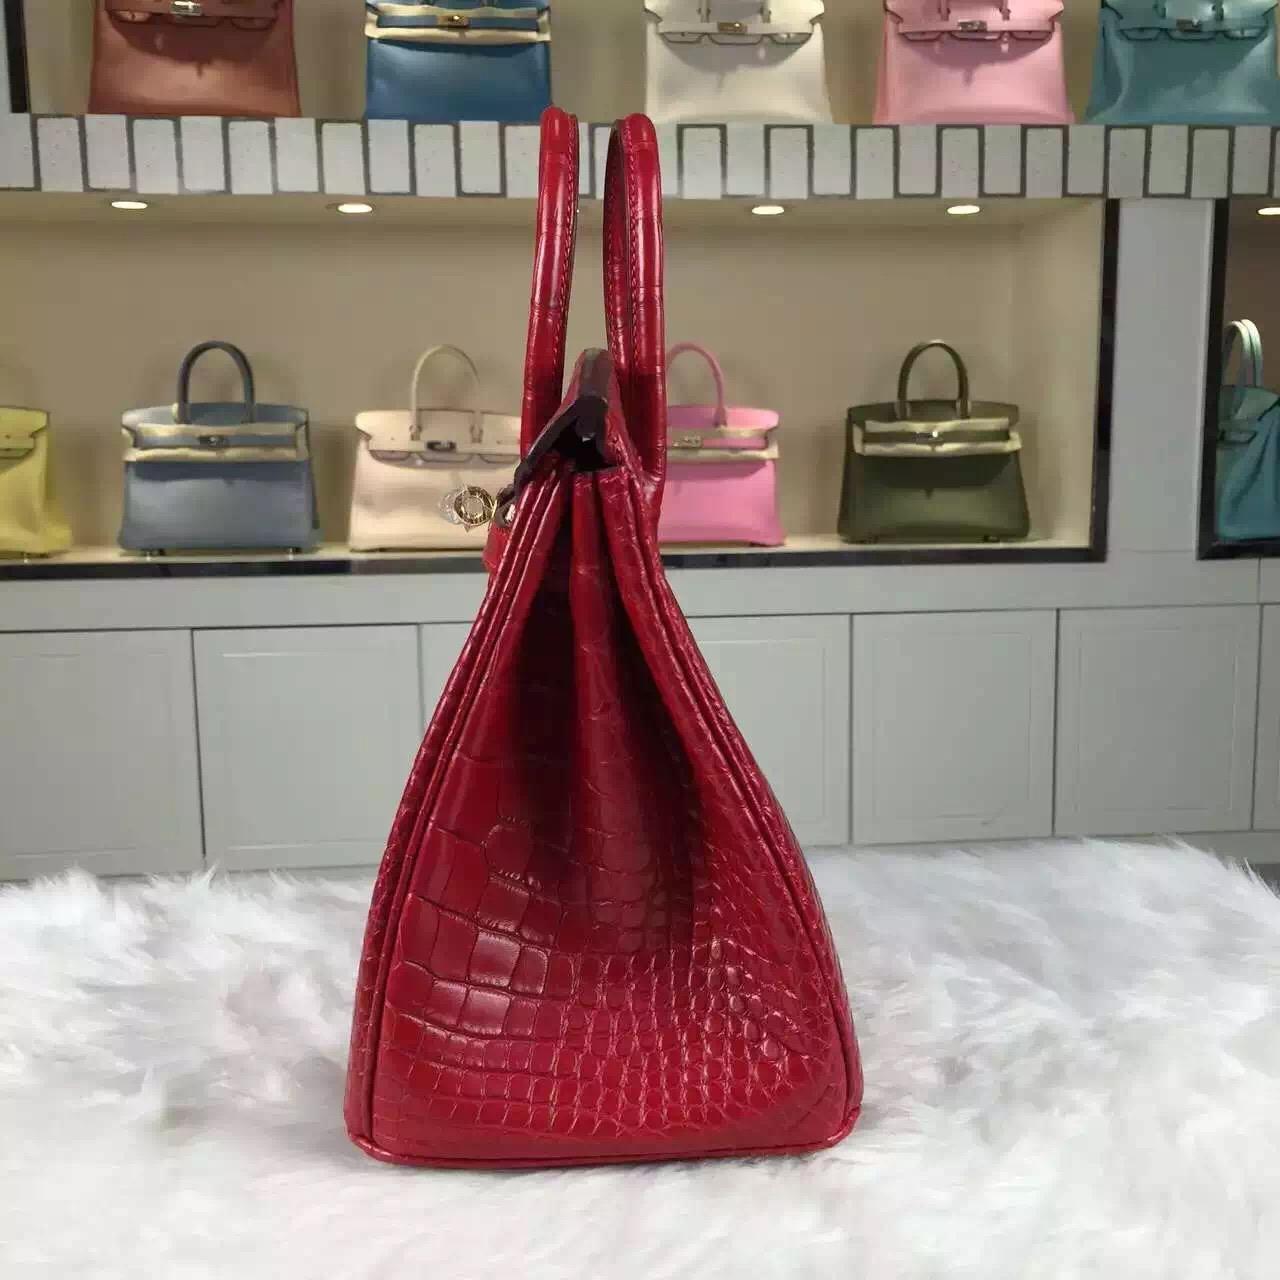 High Quality Hermes Red HCP Crocodile Matt Leather Birkin Bag25cm Gold Hardware